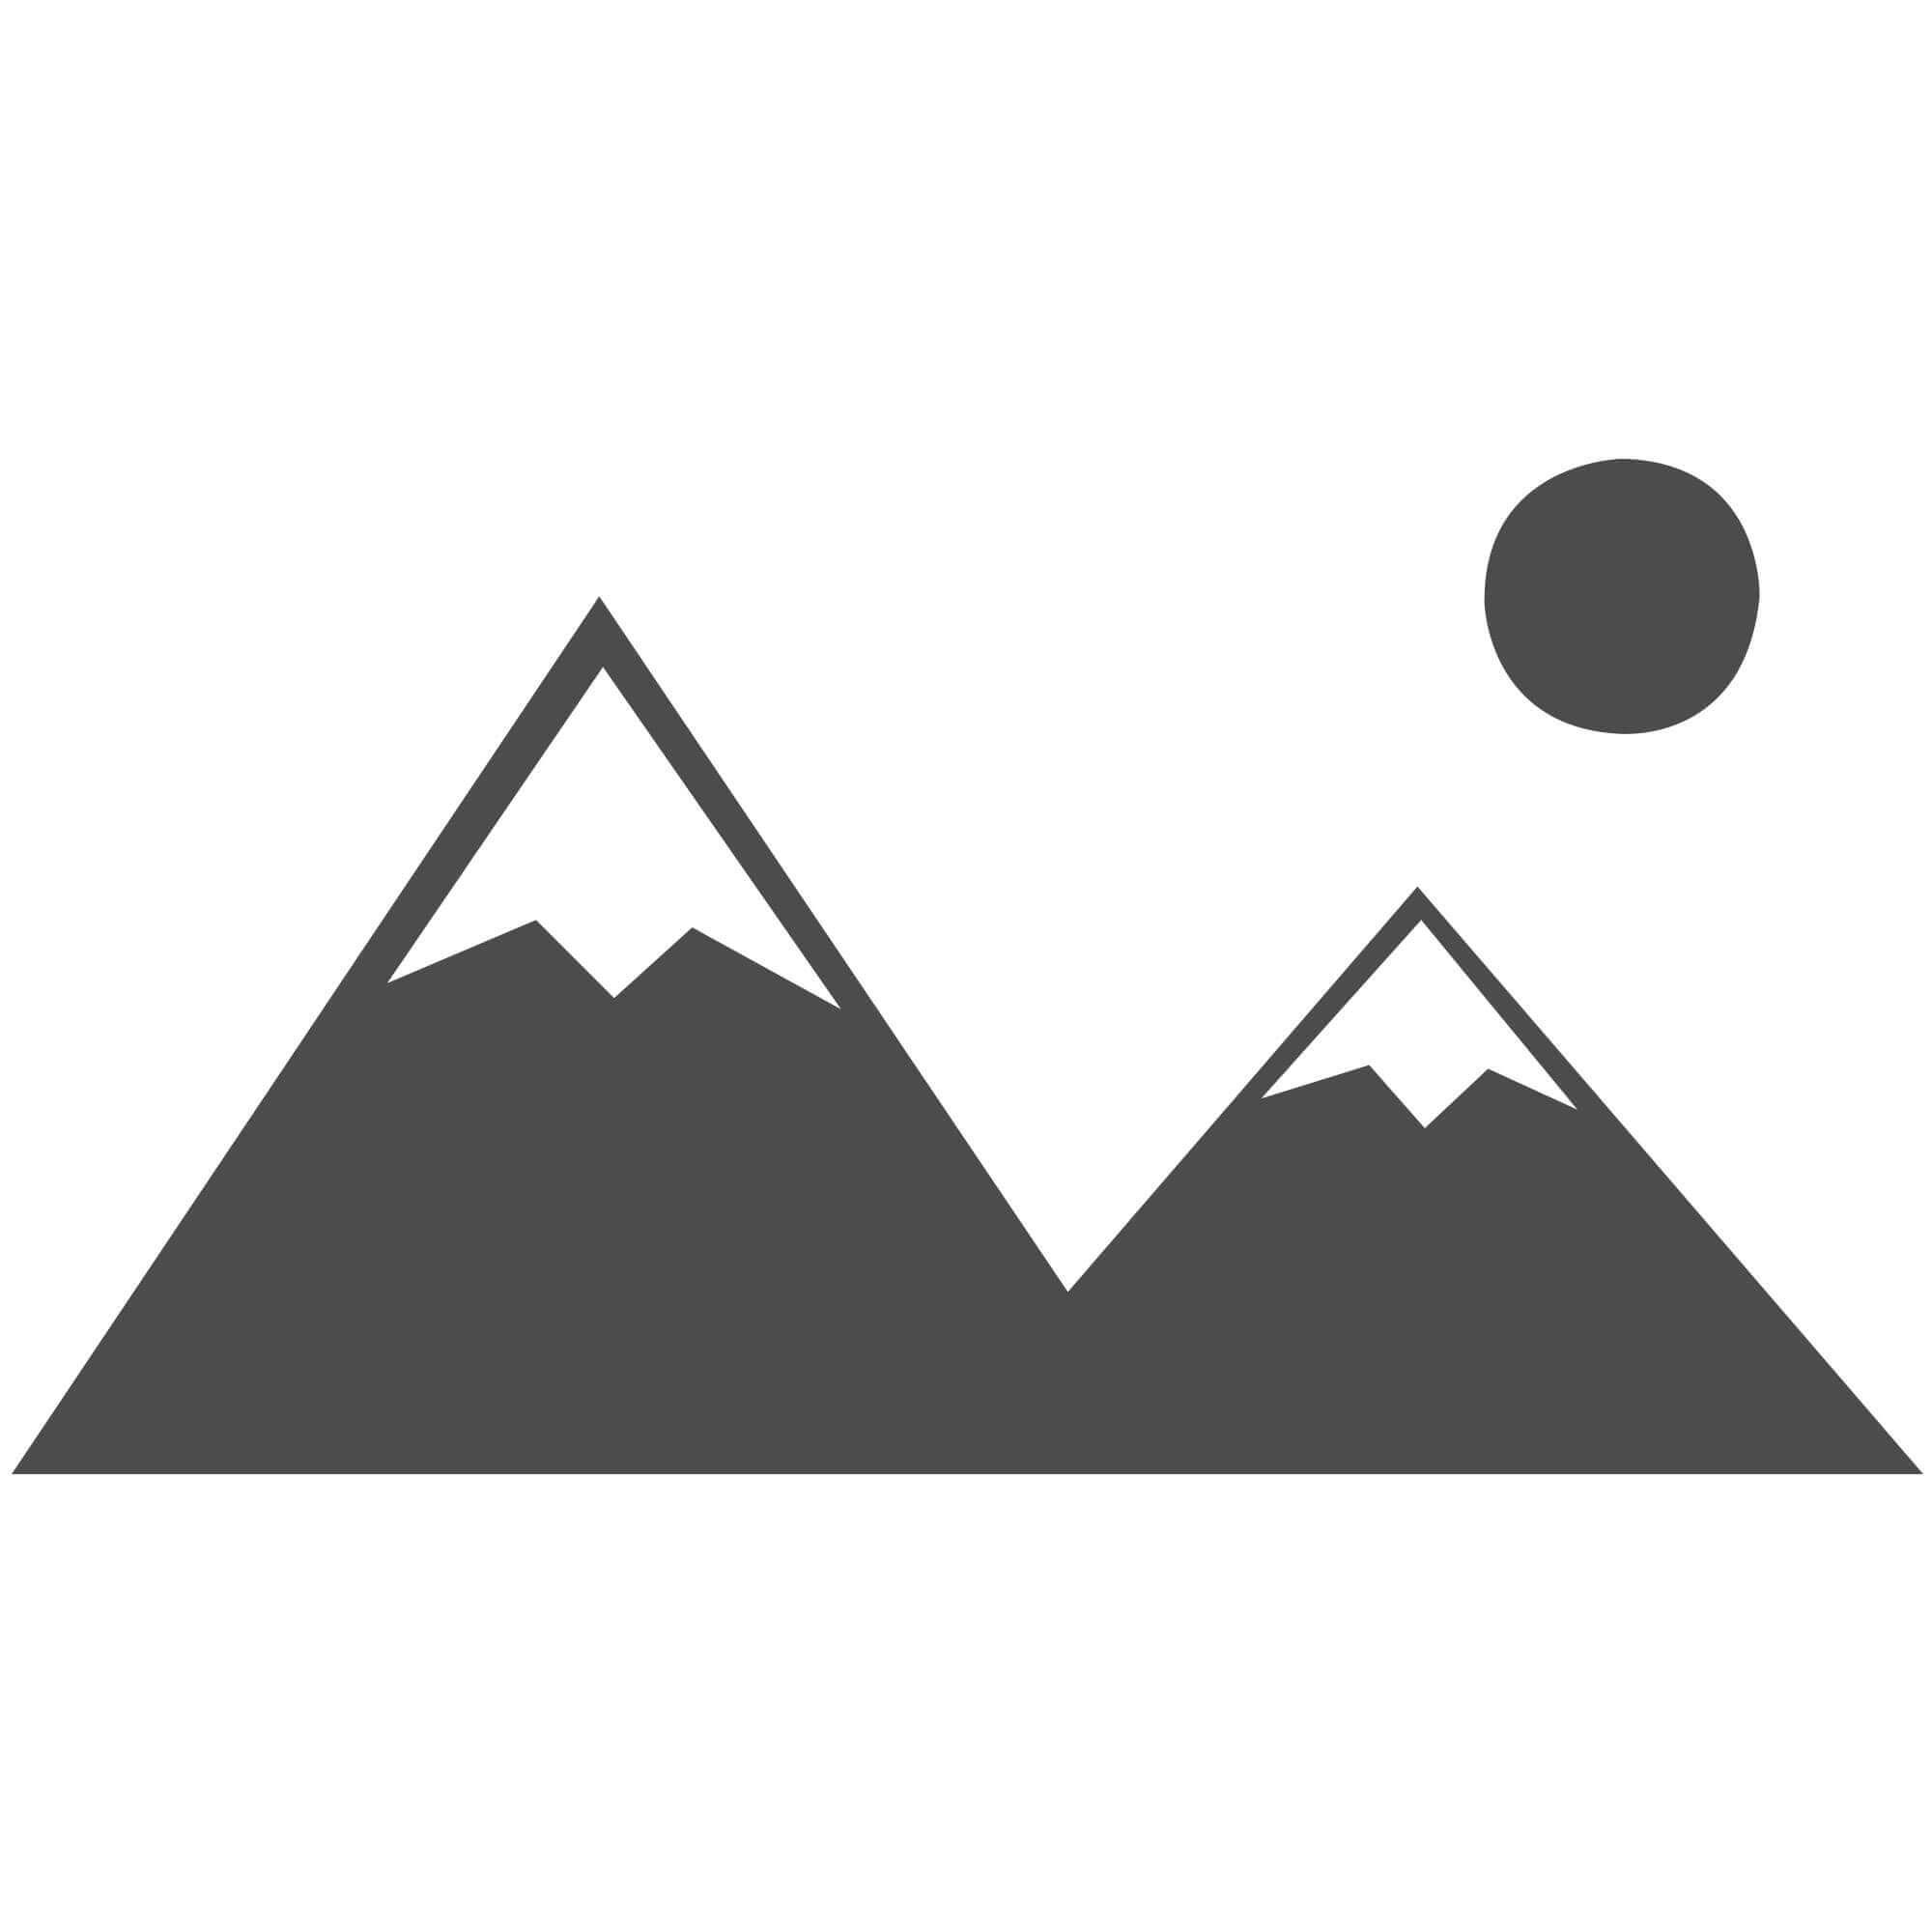 "Galleria Rug - Tiles Multi 63484 3747 - Size 120 x 170 cm (4' x 5'7"")"